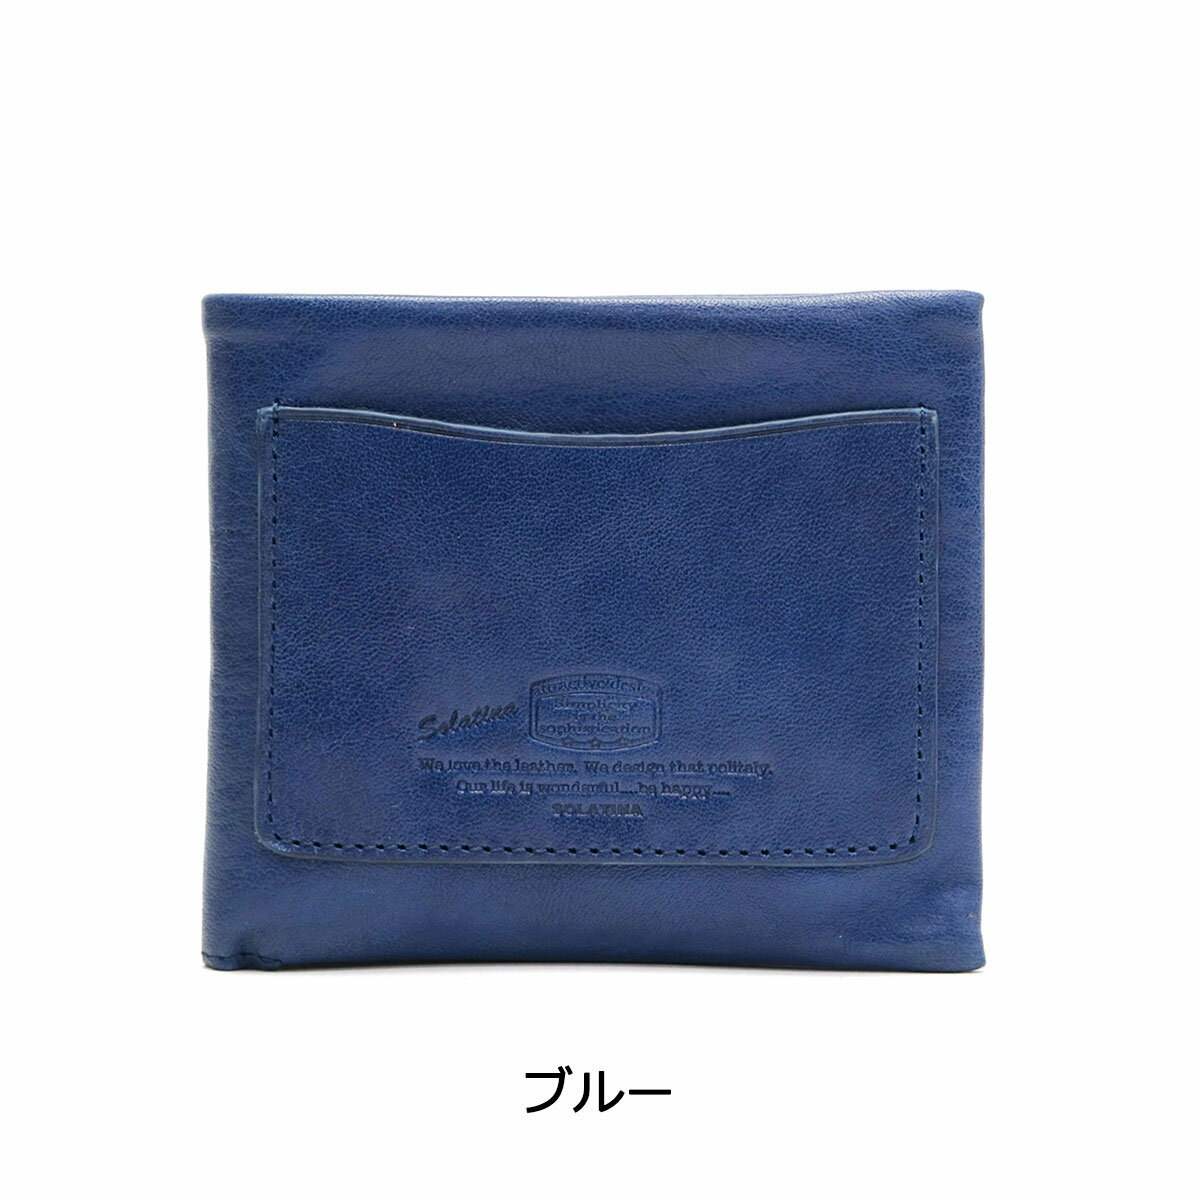 SOLATINA(ソラチナ)『二つ折り財布(SW-60054)』